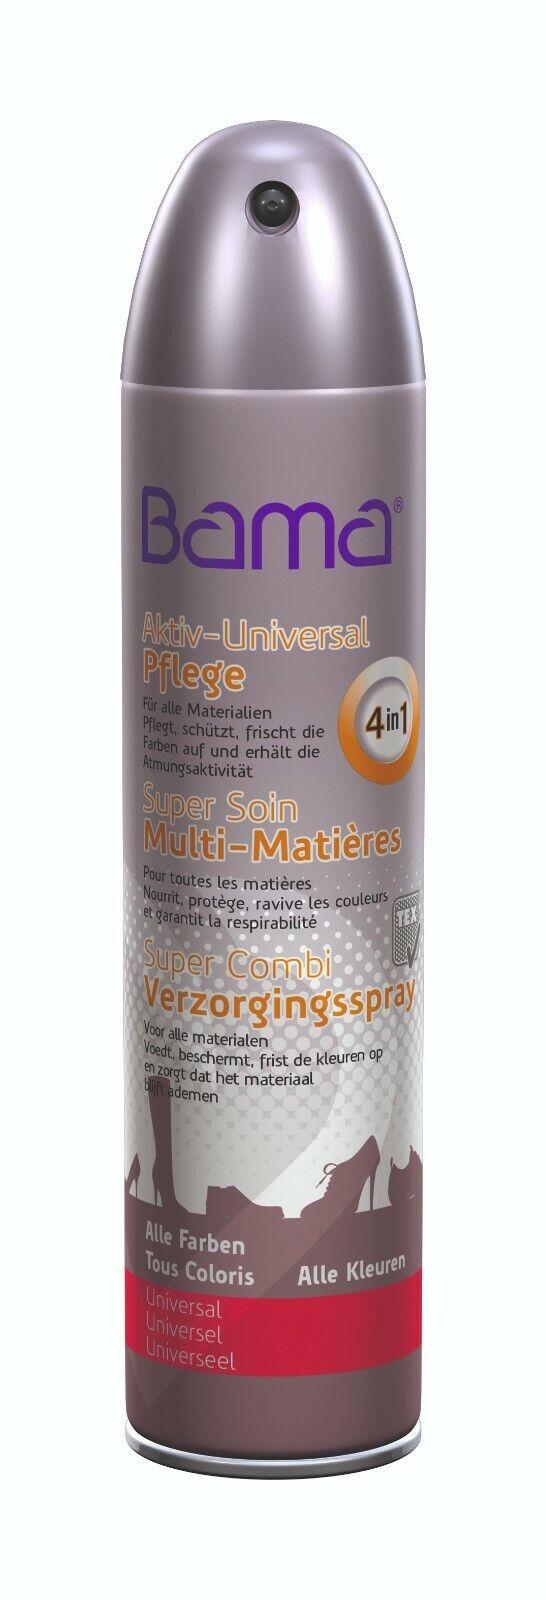 (3,98€/100ml) Bama Aktiv Universal Pflege mit Farbaktivierung 300 ml - 34A46